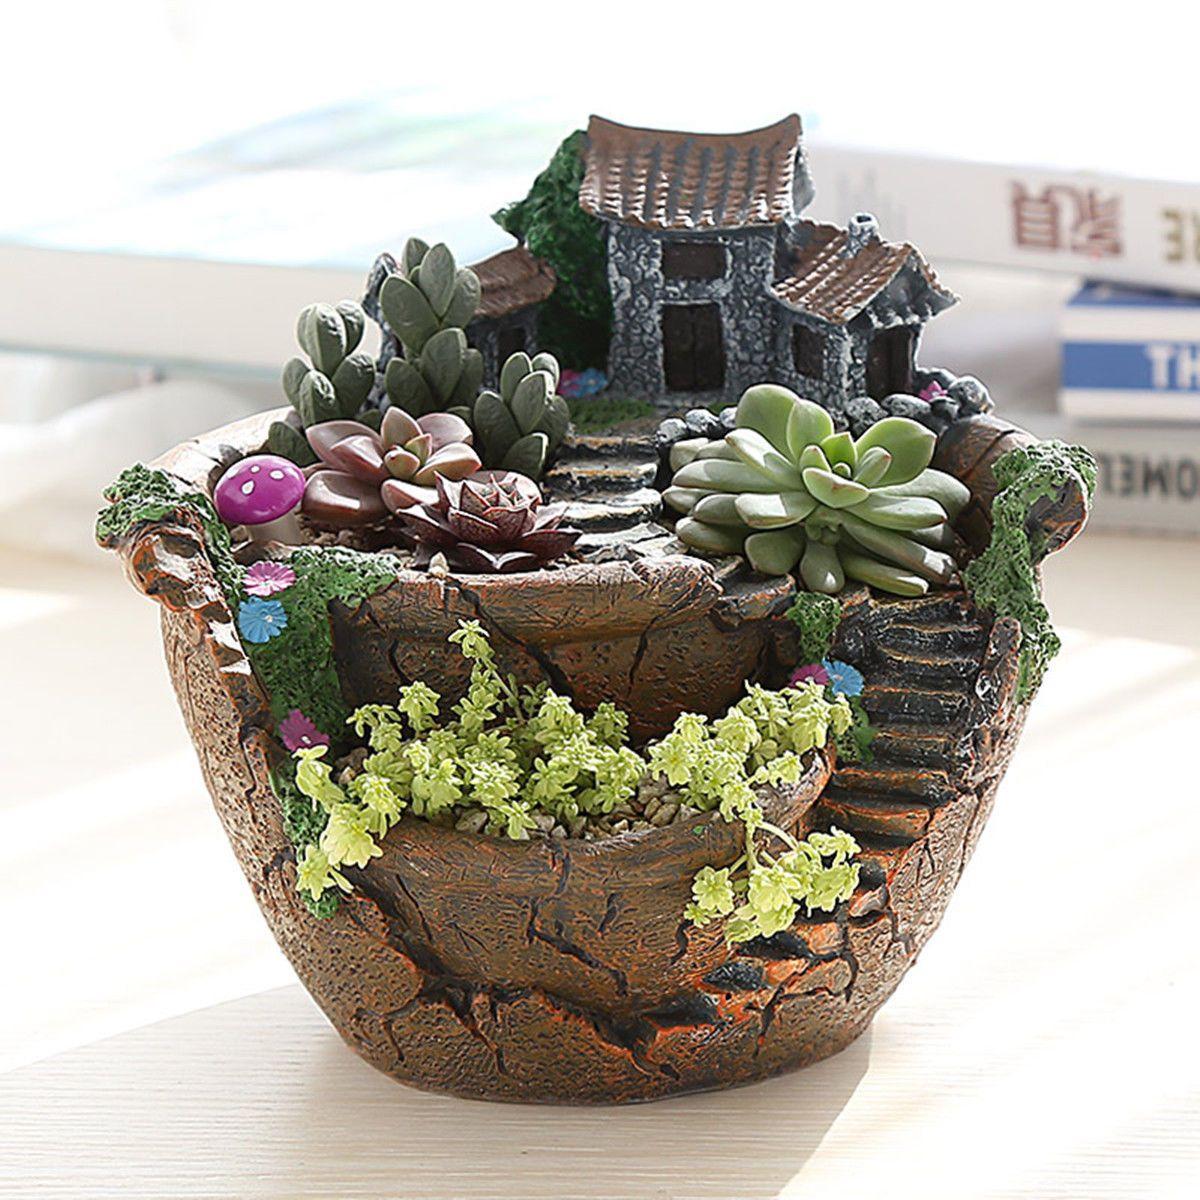 Sky Garden Planter Herb Flower Cactus Succulent Clay Pot